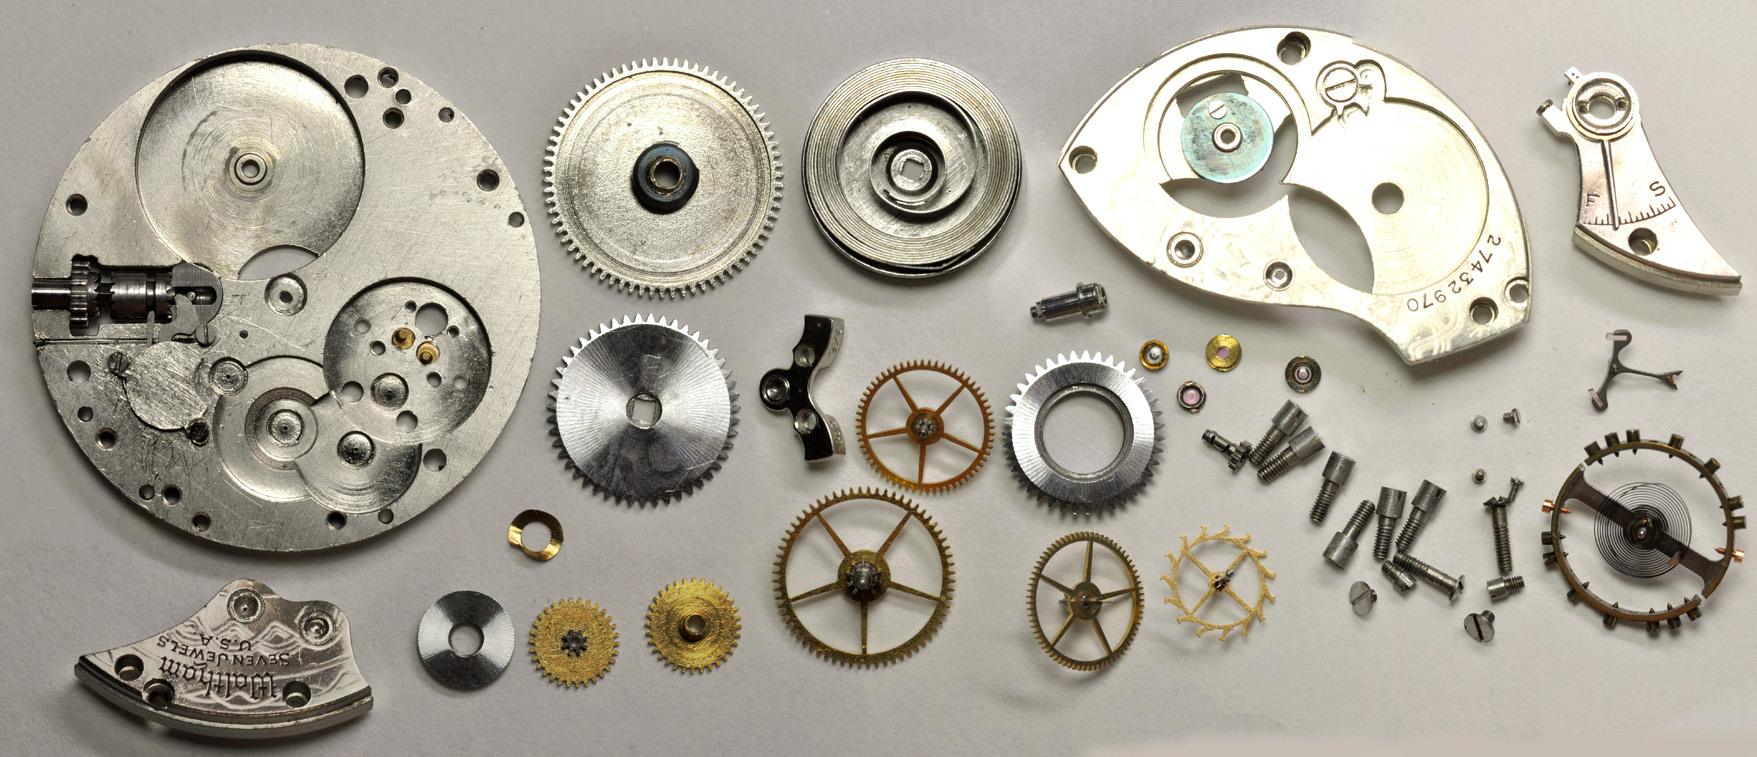 WALTHAM 3/0サイズ 7石 腕時計_c0083109_1120050.jpg